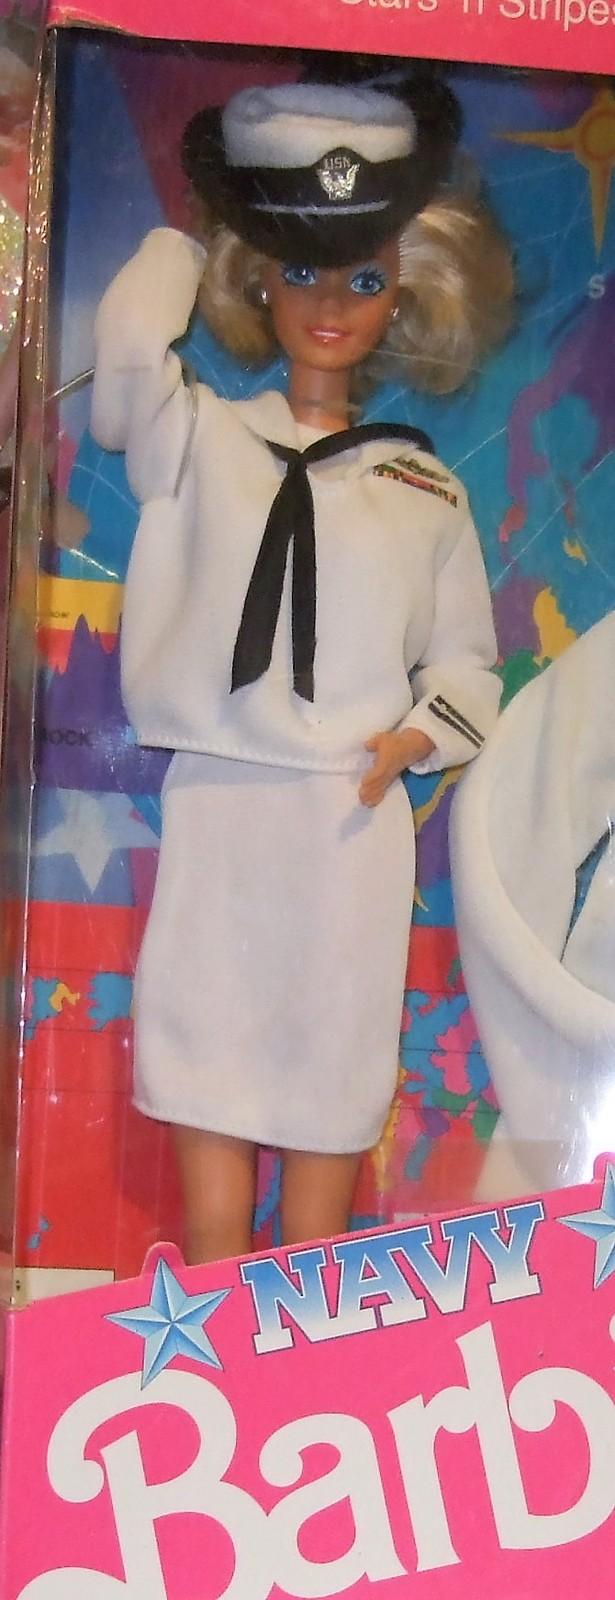 Barbie Doll - Stars 'n' Stripes - Navy Barbie